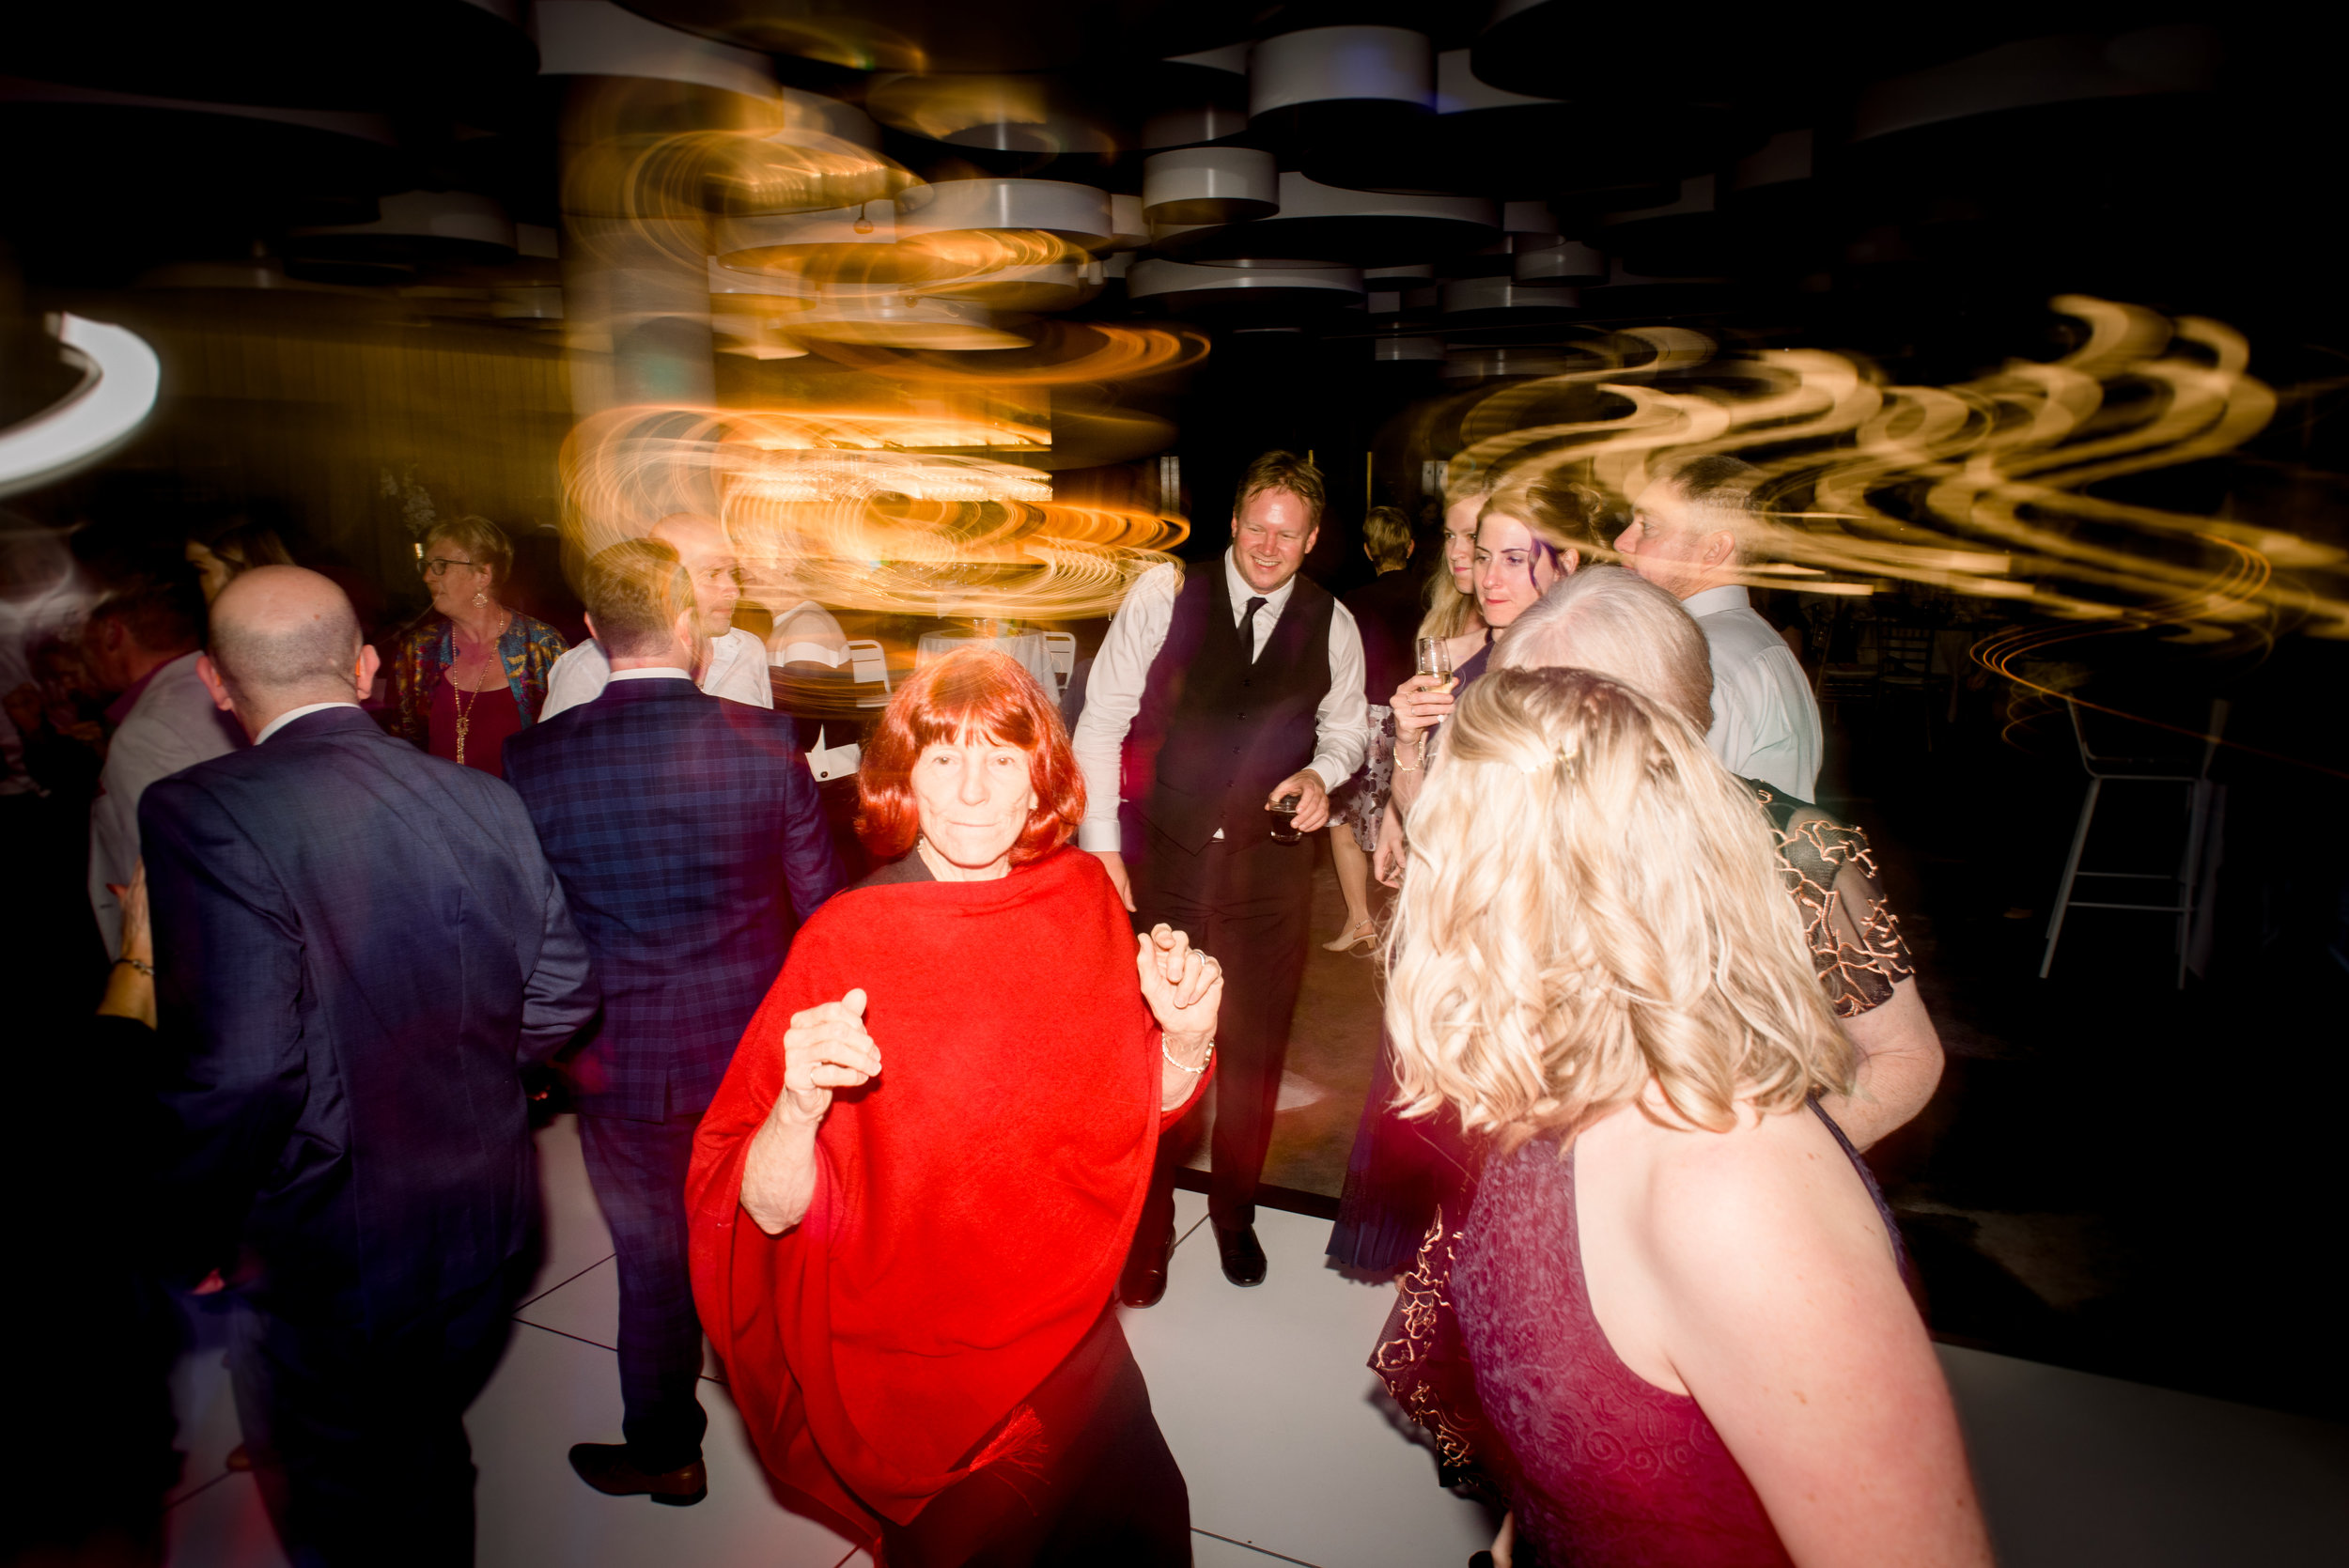 brisbane-city-wedding-photographer-romantic-wedding-129.jpg